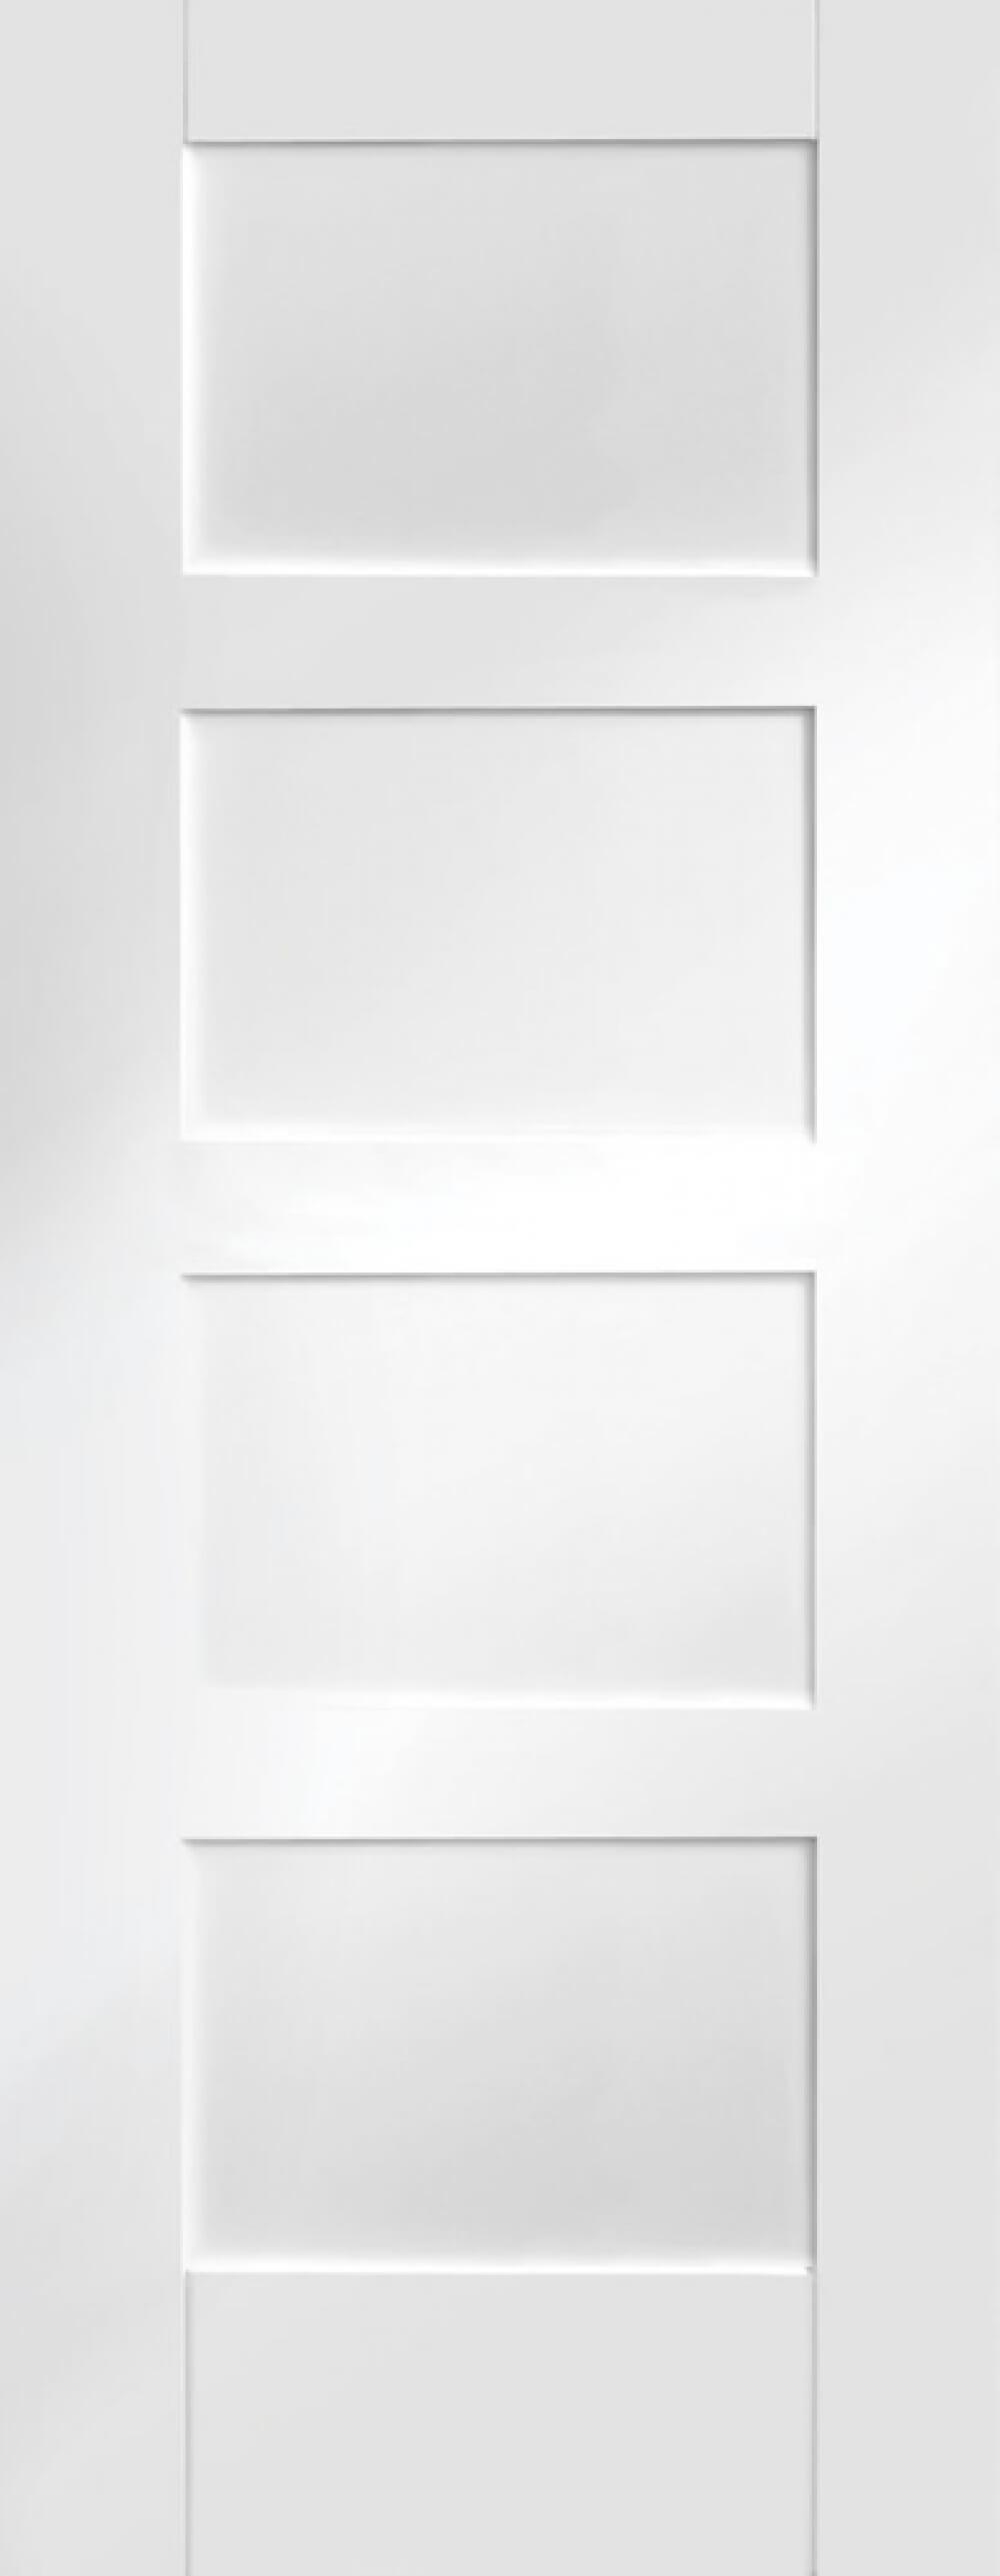 4 Panel White Shaker Door